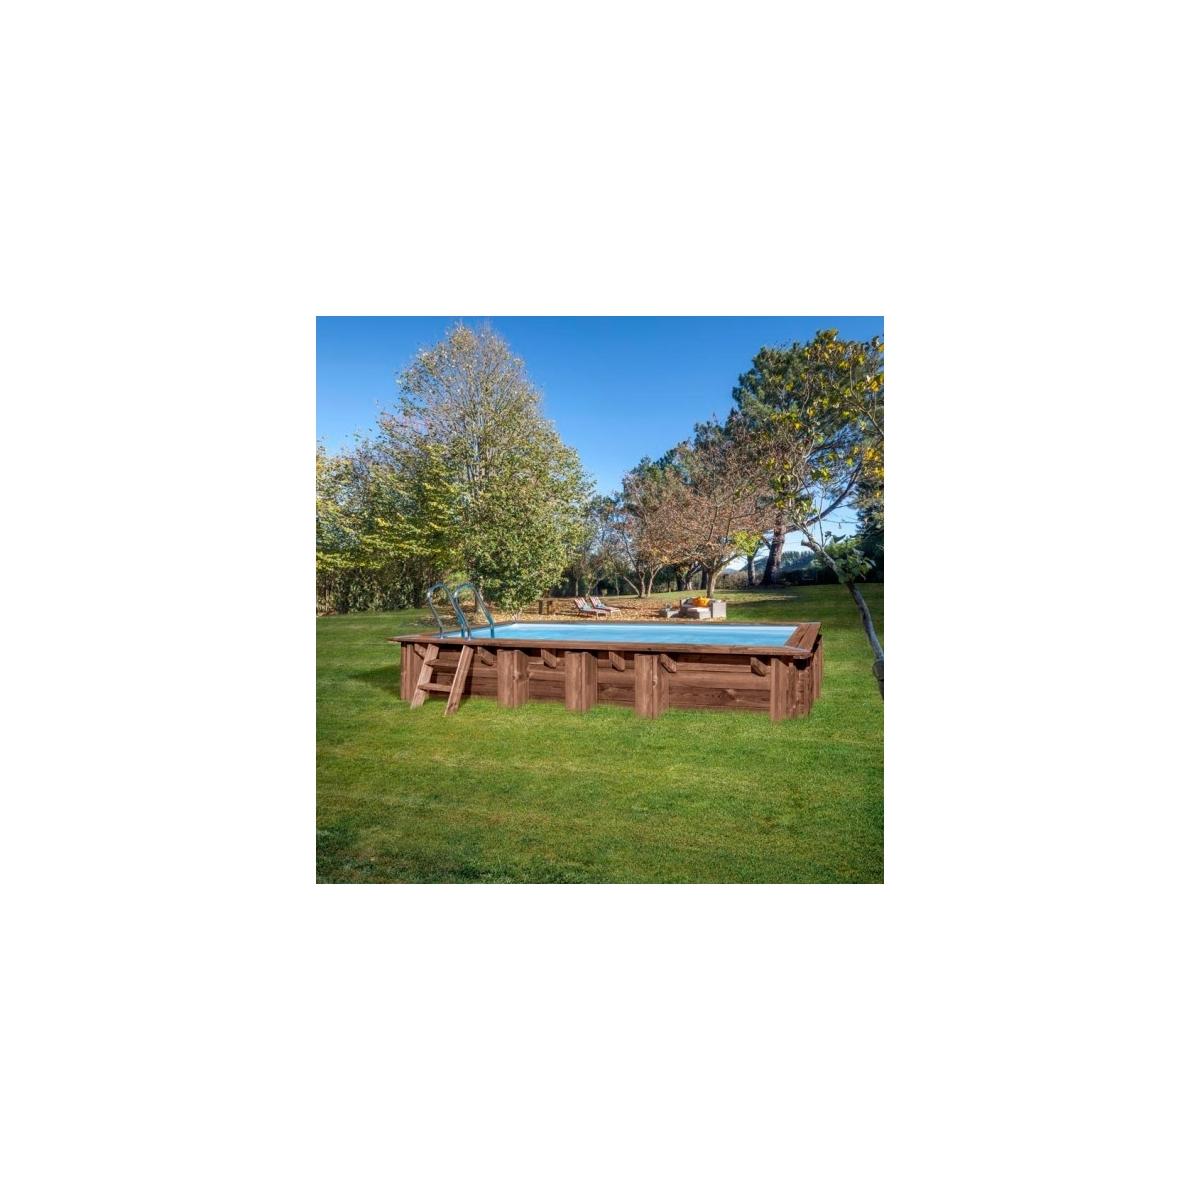 Piscina desmontable de madera Gre Sunbay Mango rectangular 618x320x130